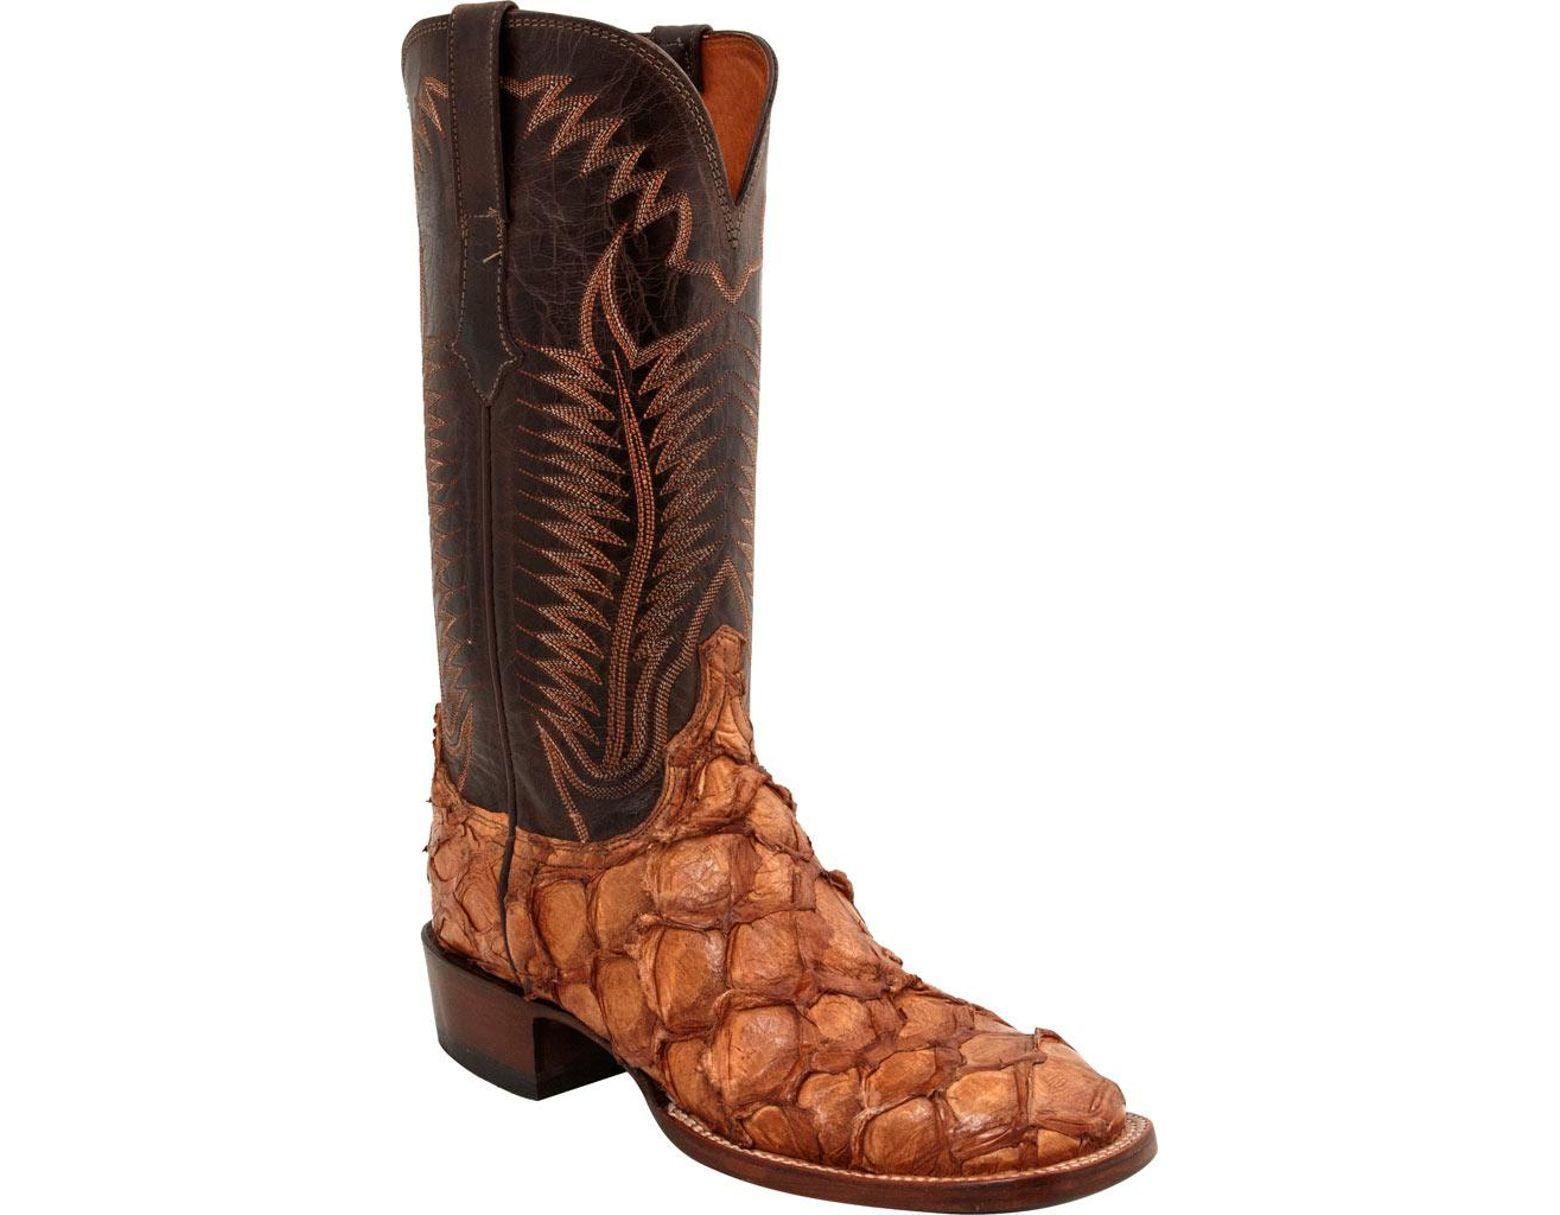 7c9edfbcf16 Men's Brown Brooks W Toe Cowboy Boot